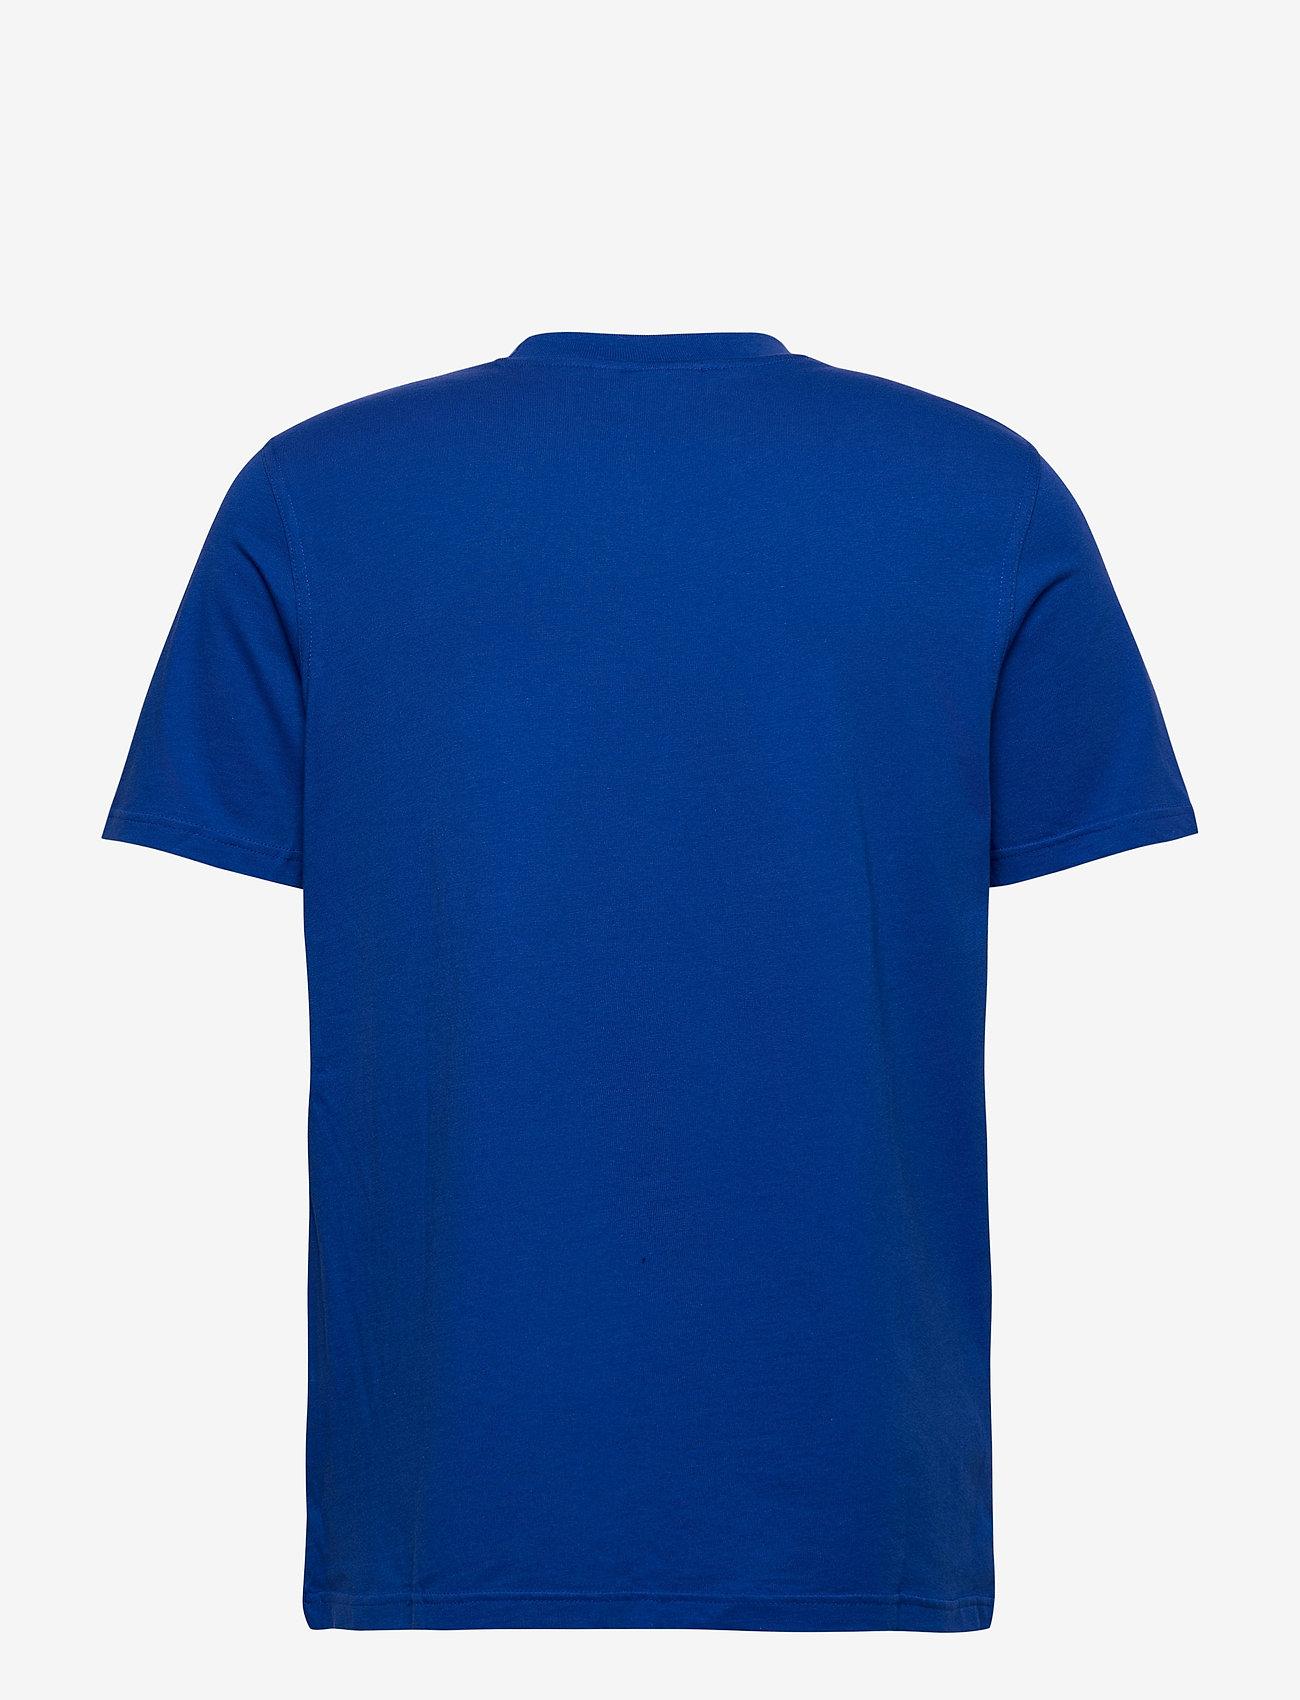 adidas Originals TREFOIL TEE OUT - T-skjorter ROYBLU - Menn Klær